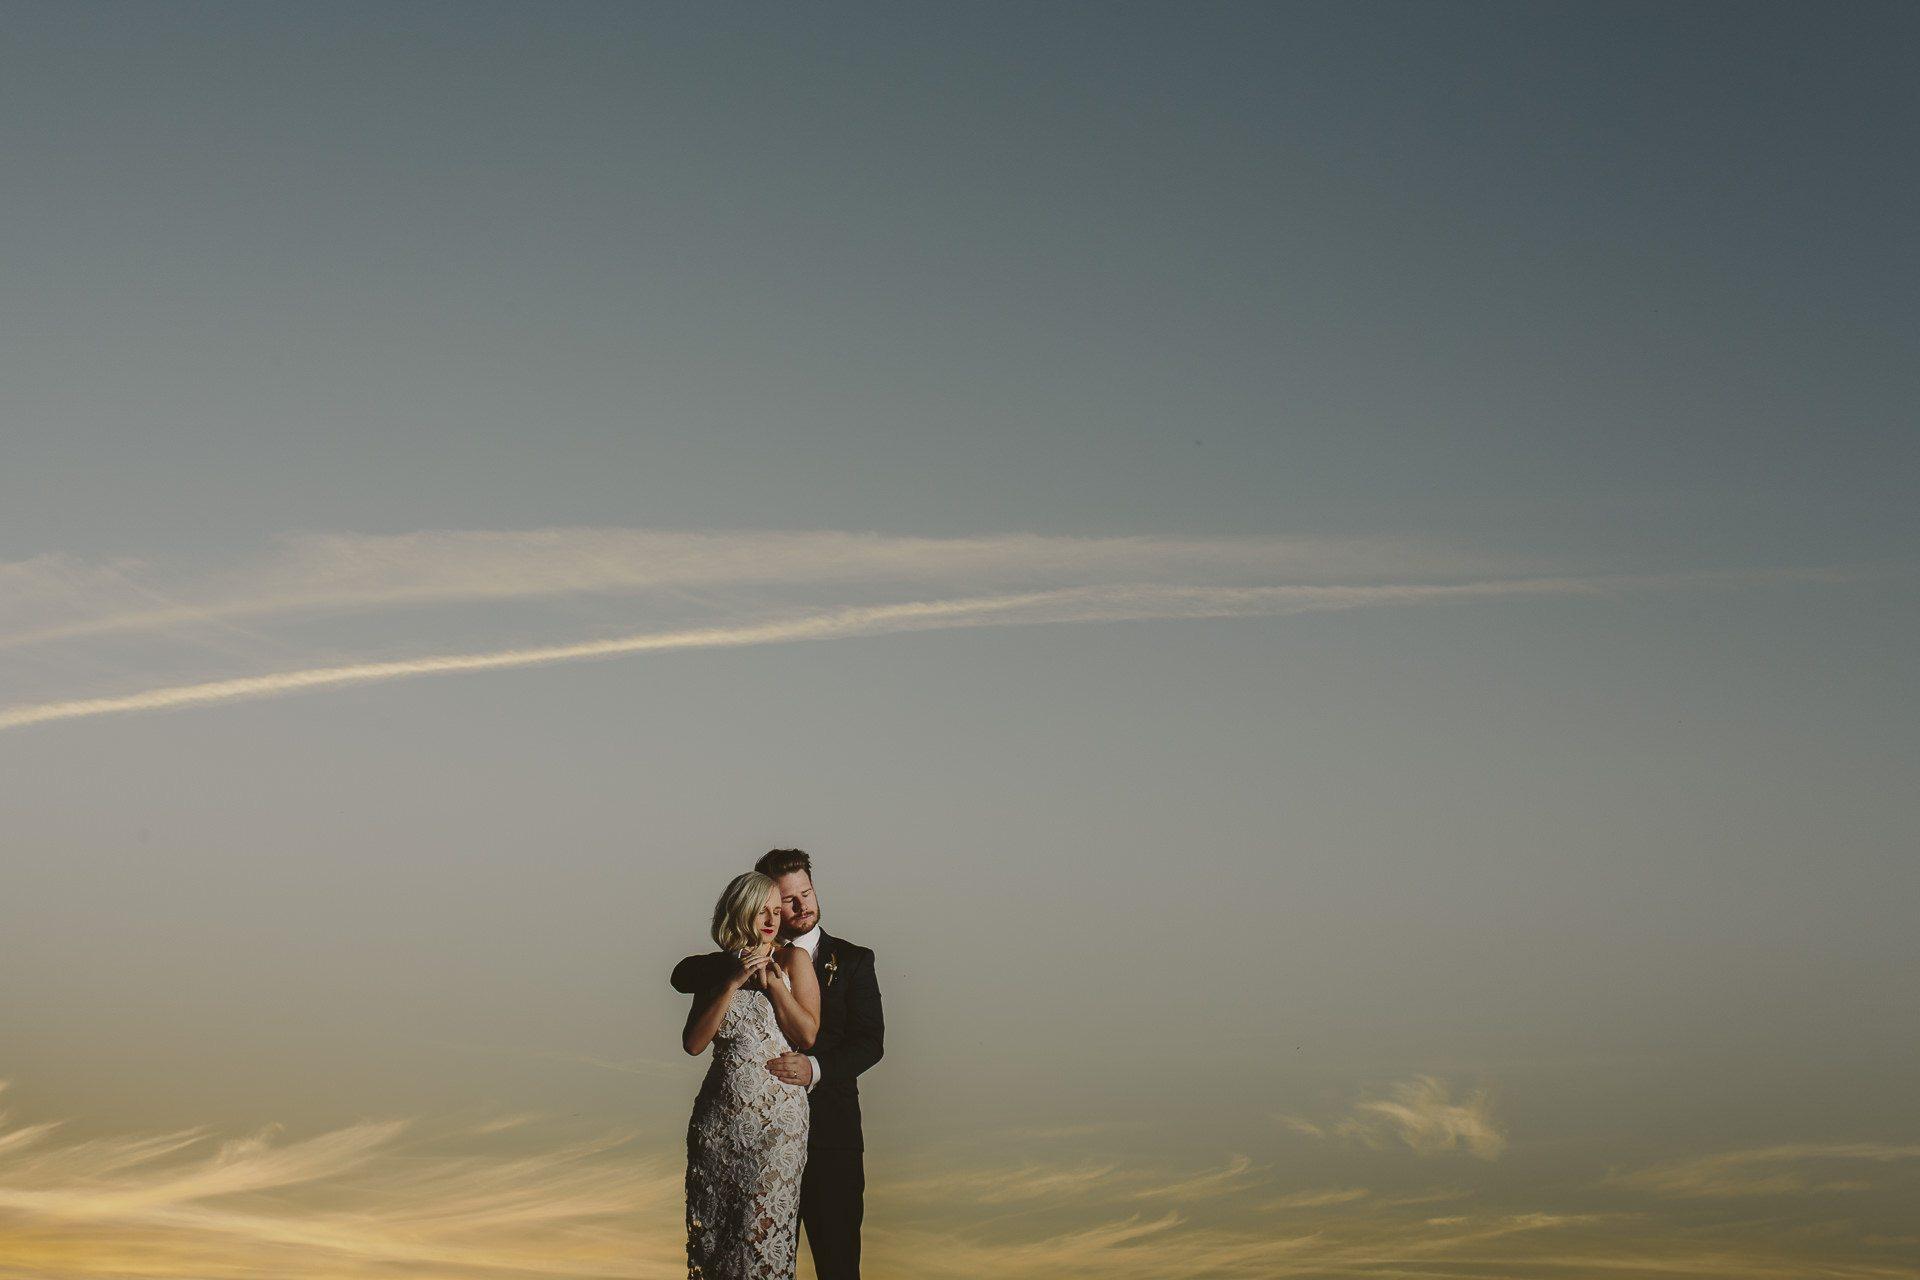 hamilton-wedding-portrait-photographer-at-116